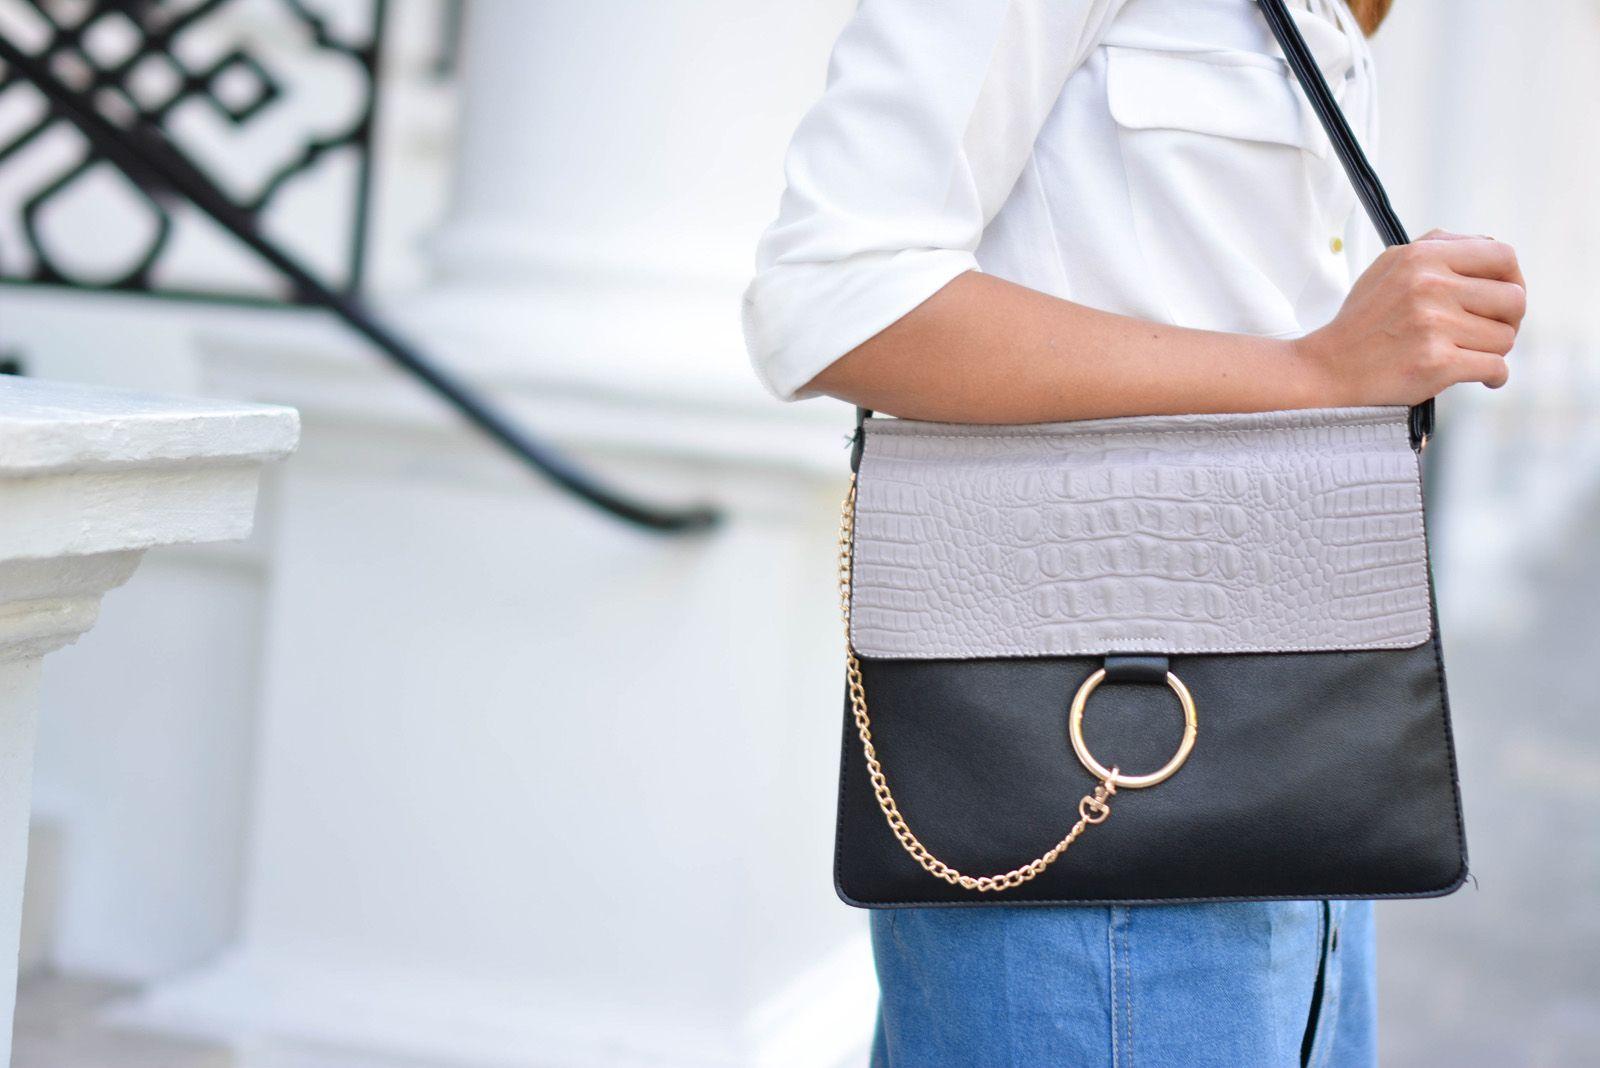 Chloe Faye dupe bag for under £25!   Fashion   Handbags   Pinterest   Bag, Denim skirt and Fashion